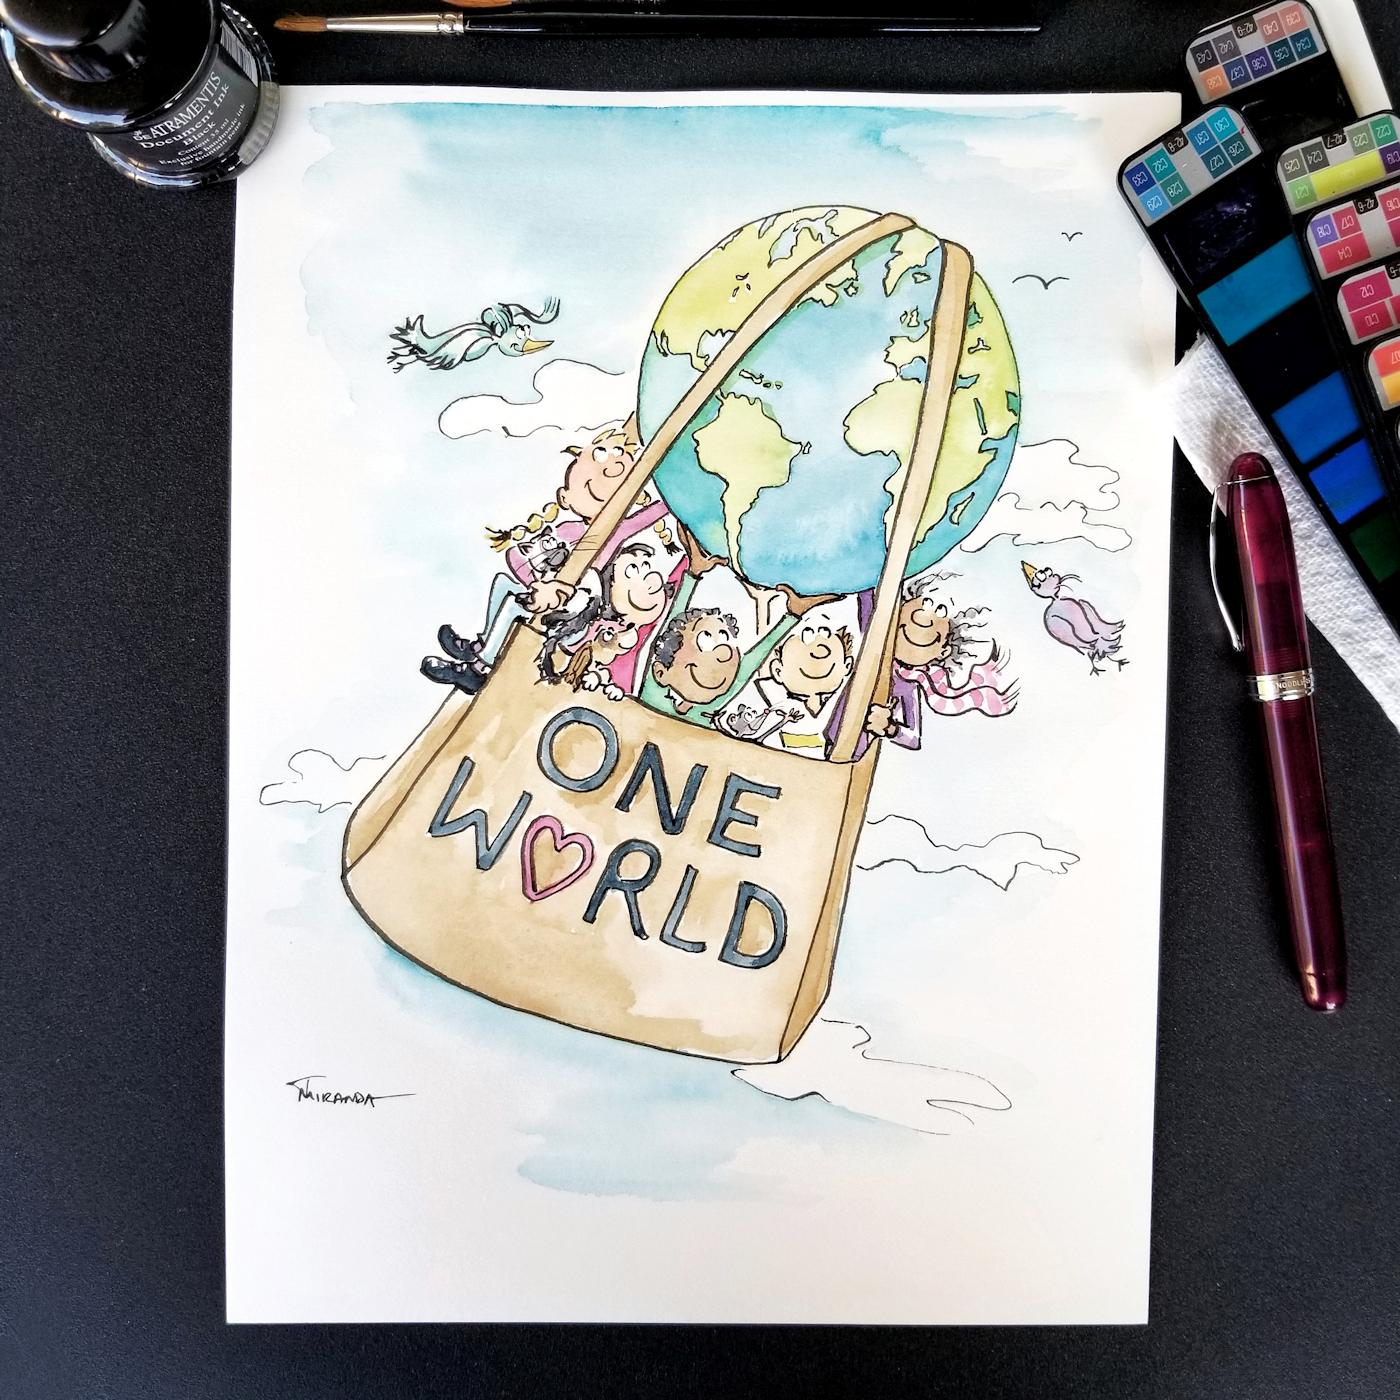 JMSC-215 One World photo of original illustration by Joana Miranda